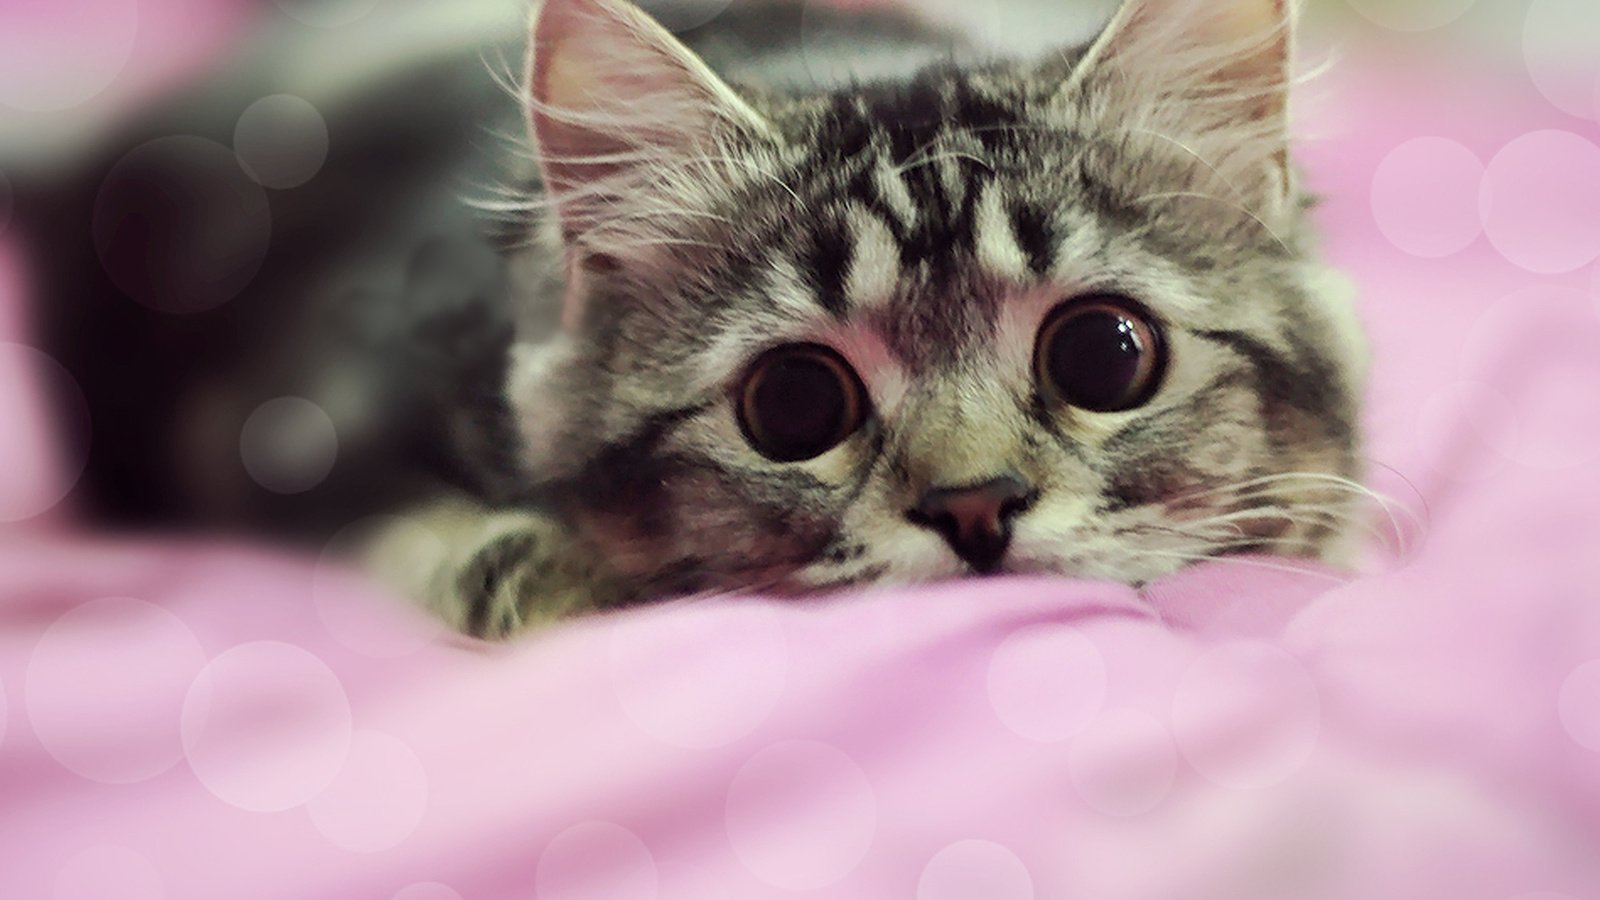 котёнок, морда, большие глаза, игра, засада